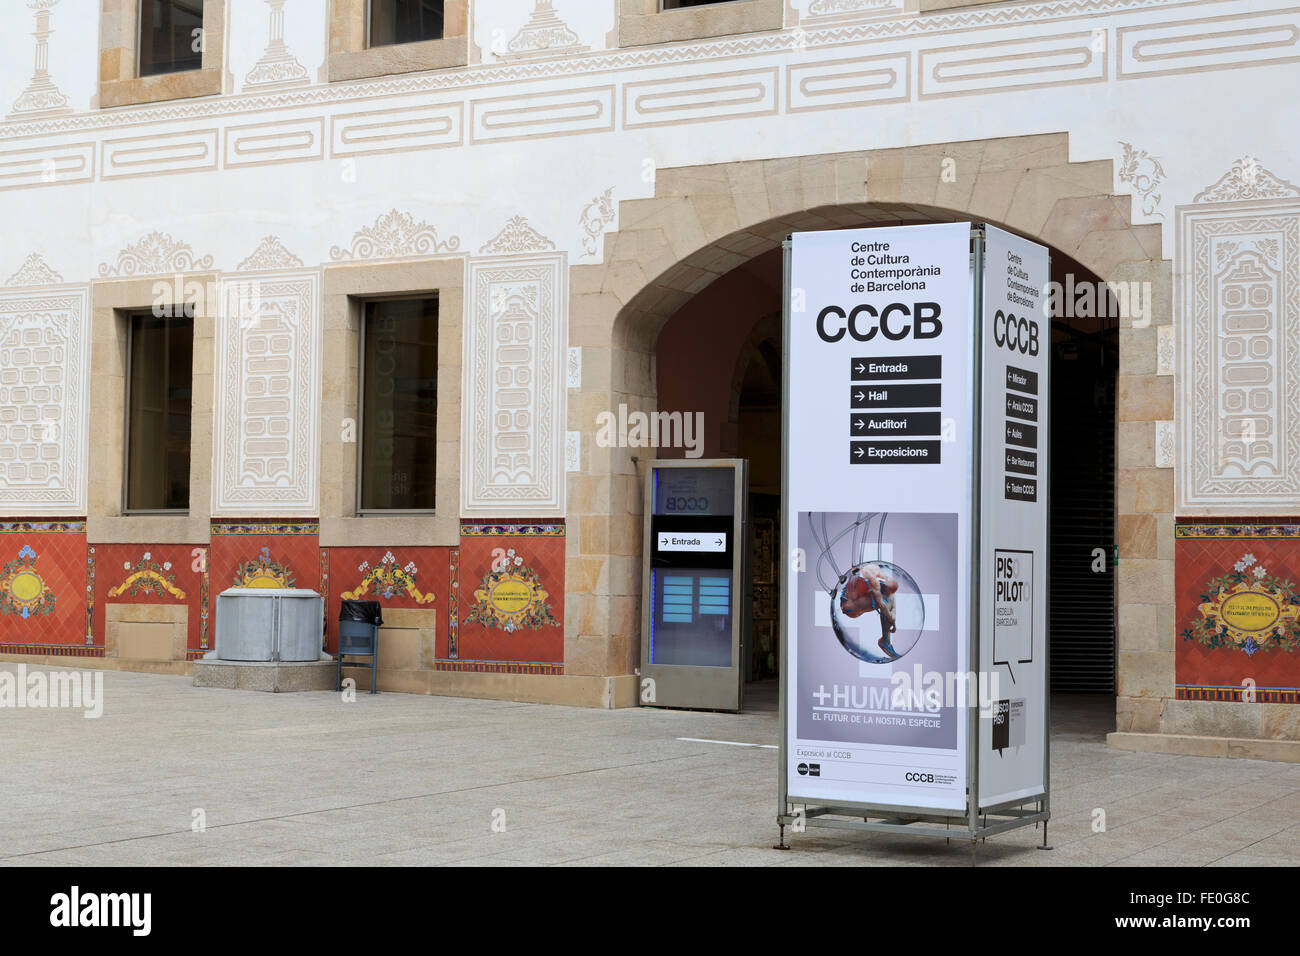 Centre de Cultura Contemporania de Barcelona, Catalonia, Spain, Europe - Stock Image